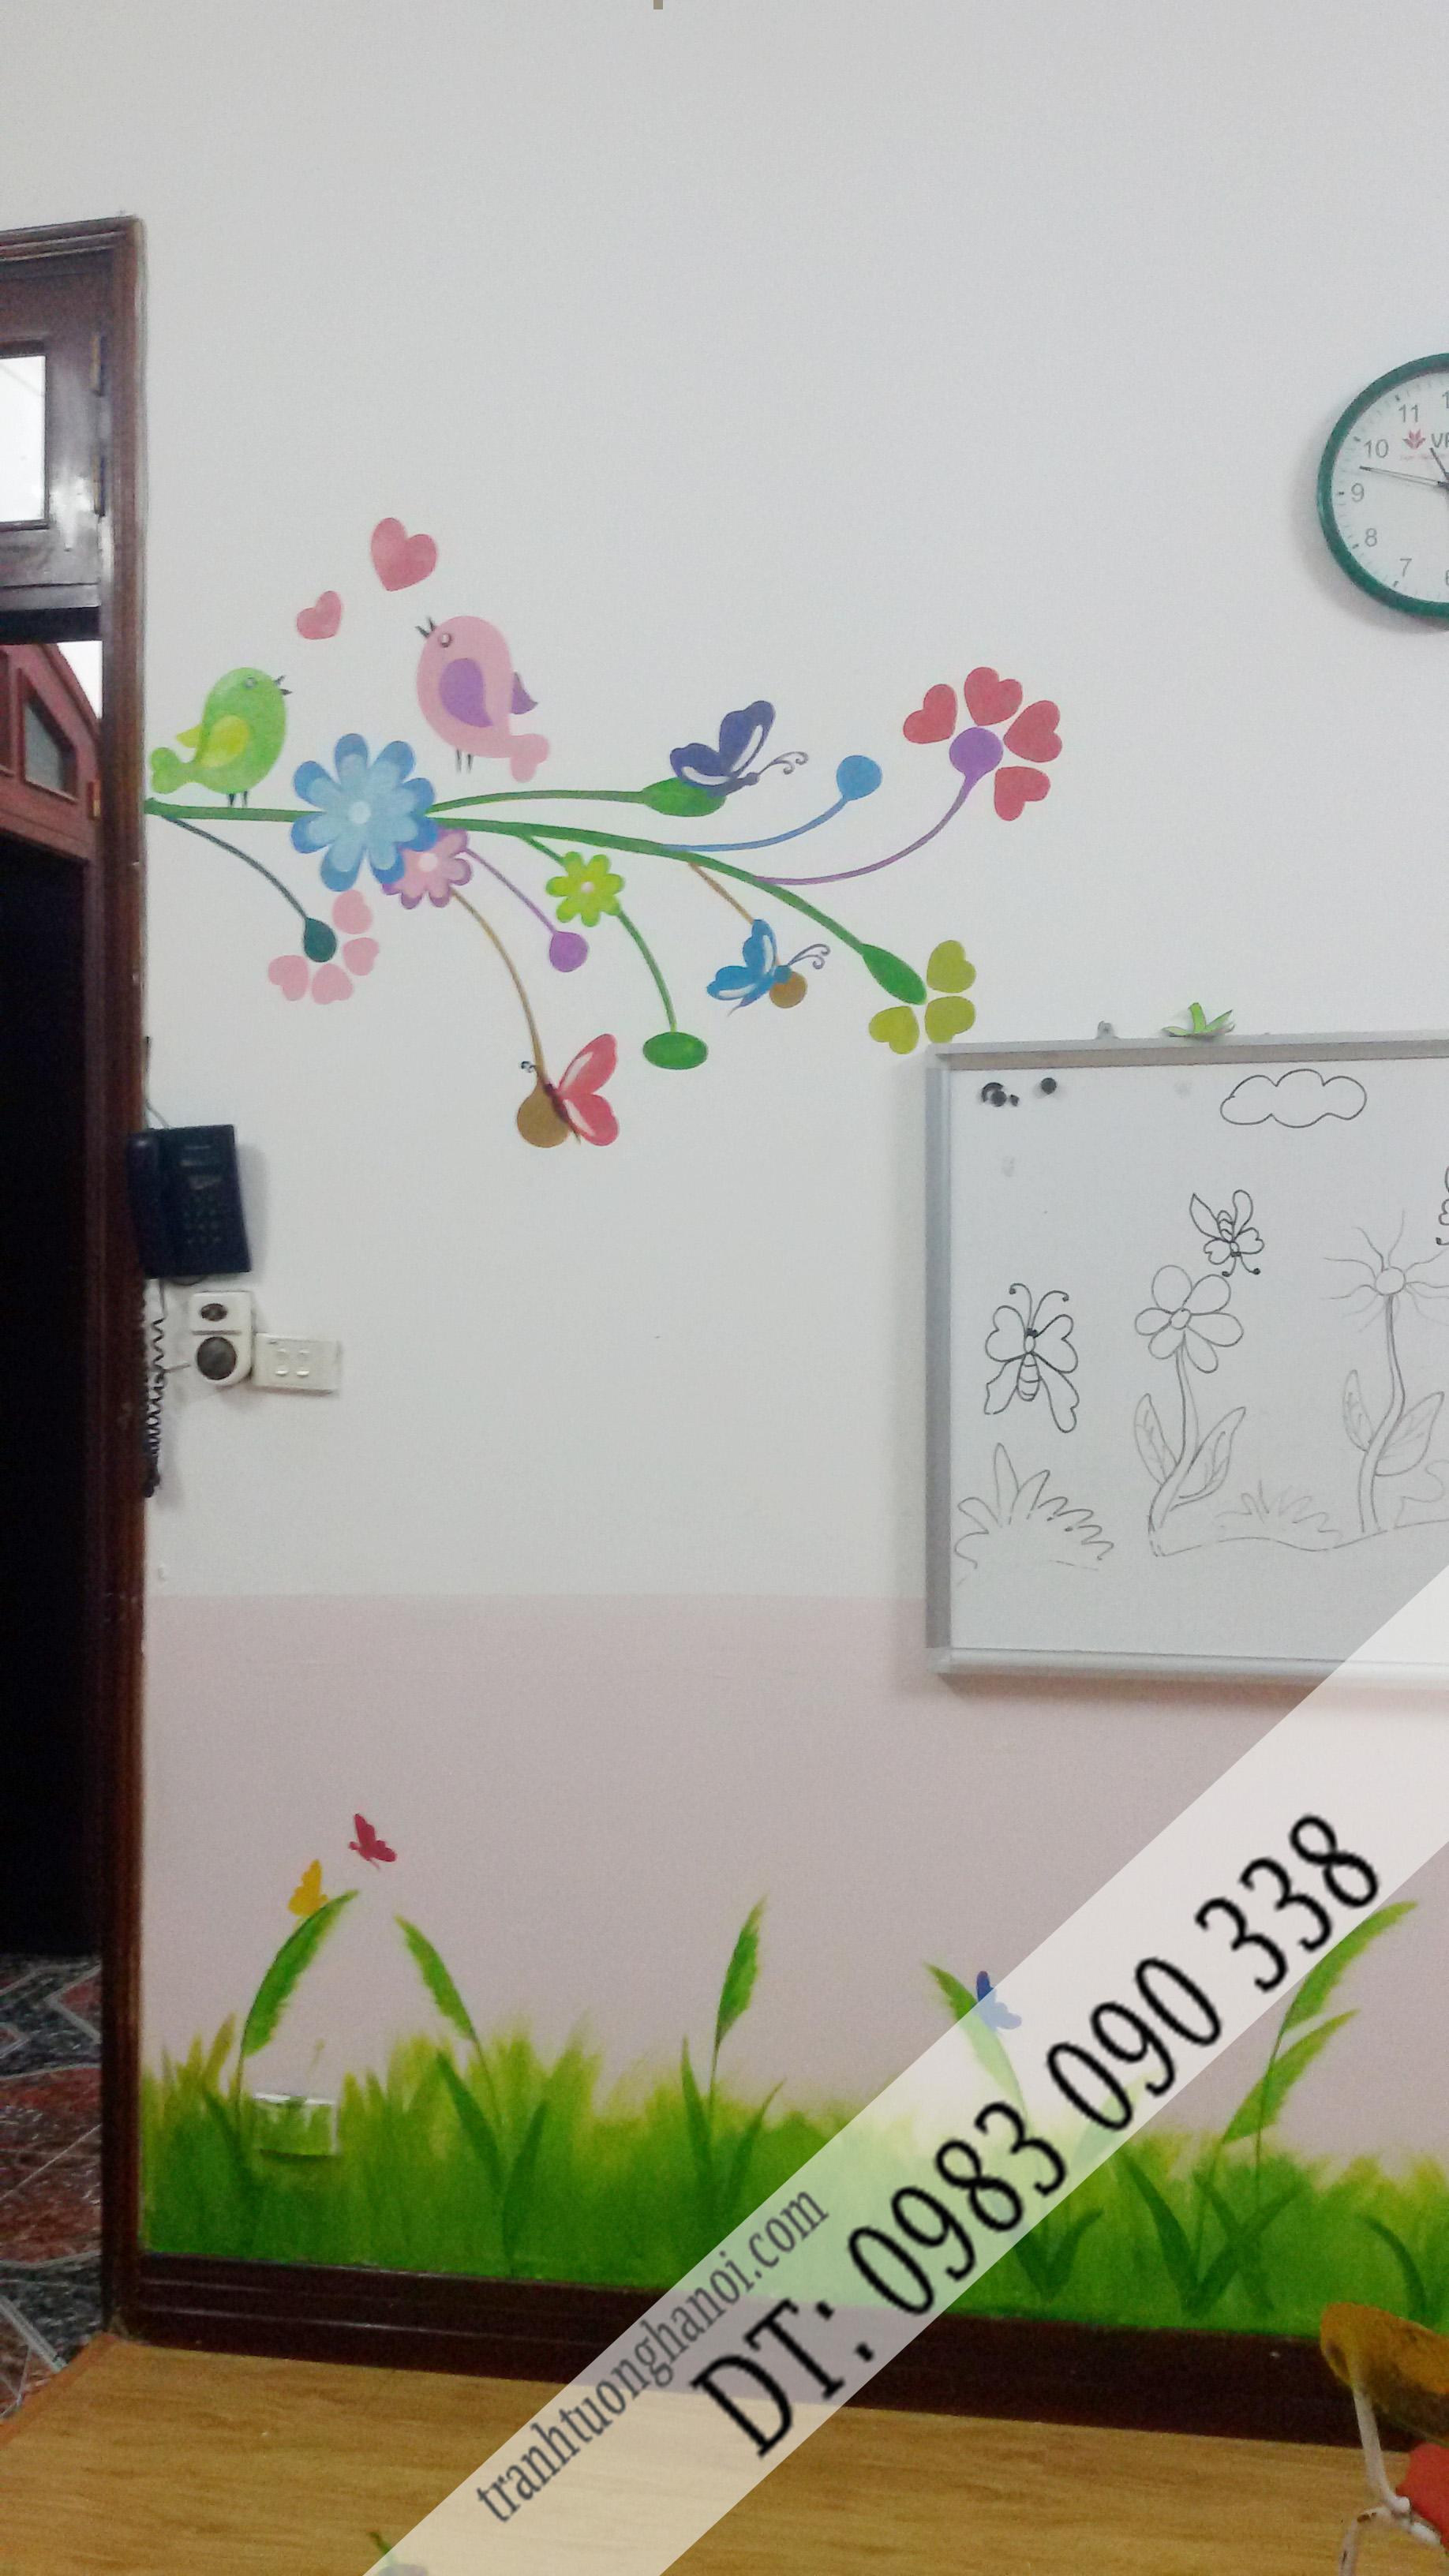 vẽ tranh tường trường mầm non kidlinks